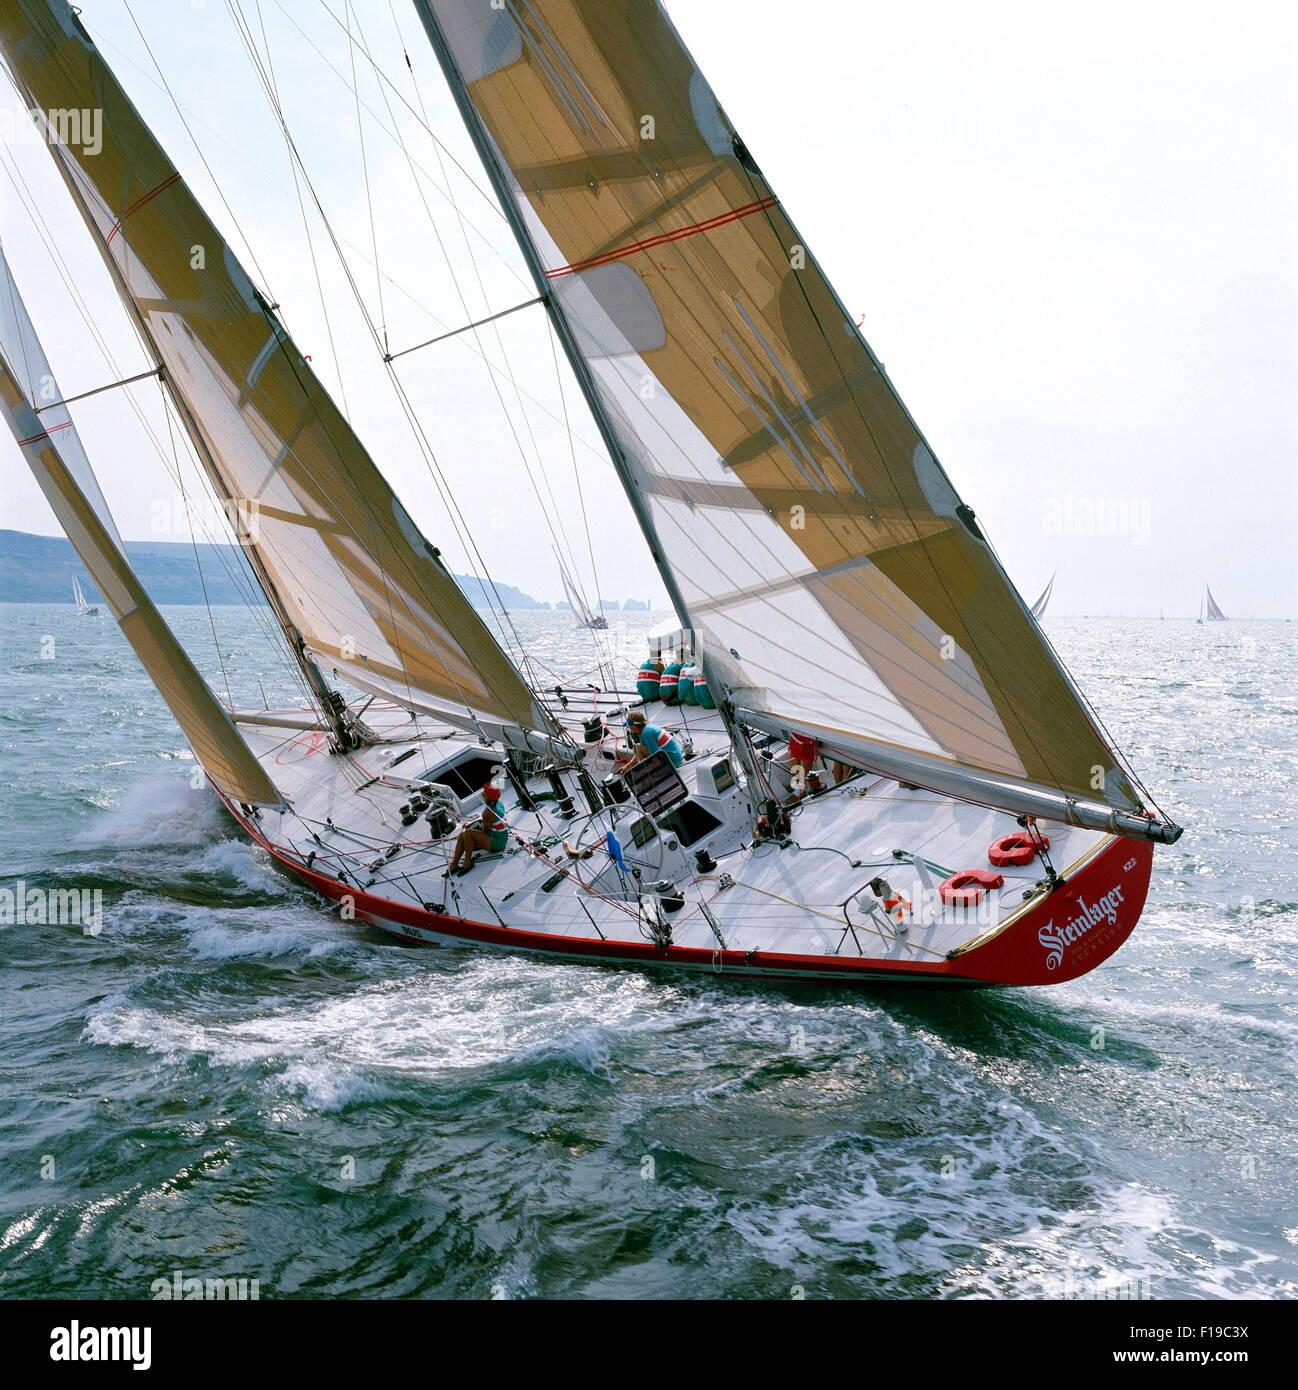 AJAXNETPHOTO. 1989. SOLENT, ENGLAND. FASTNET RACE 1989 - STEINLAGER II / SKIPPER : PETER BLAKE (NZL) OFF THE NEEDLES. - Stock Image